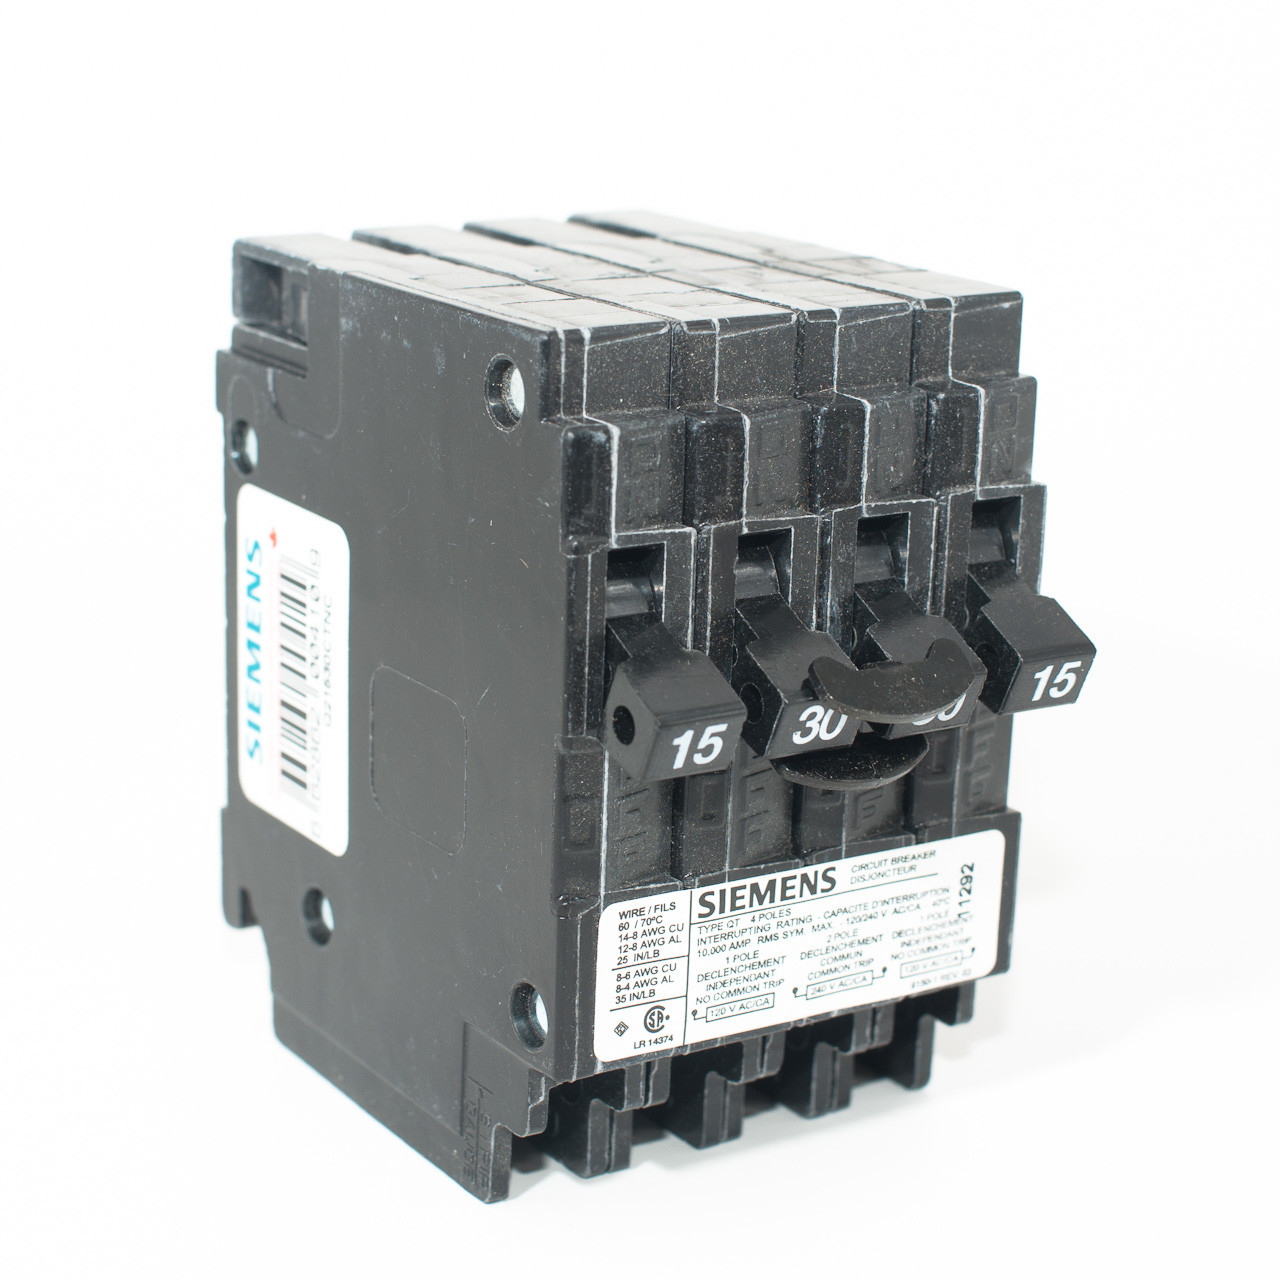 medium resolution of siemens q21530ctnc 15 2p30 15 quad push on breaker tremtech electrical systems inc